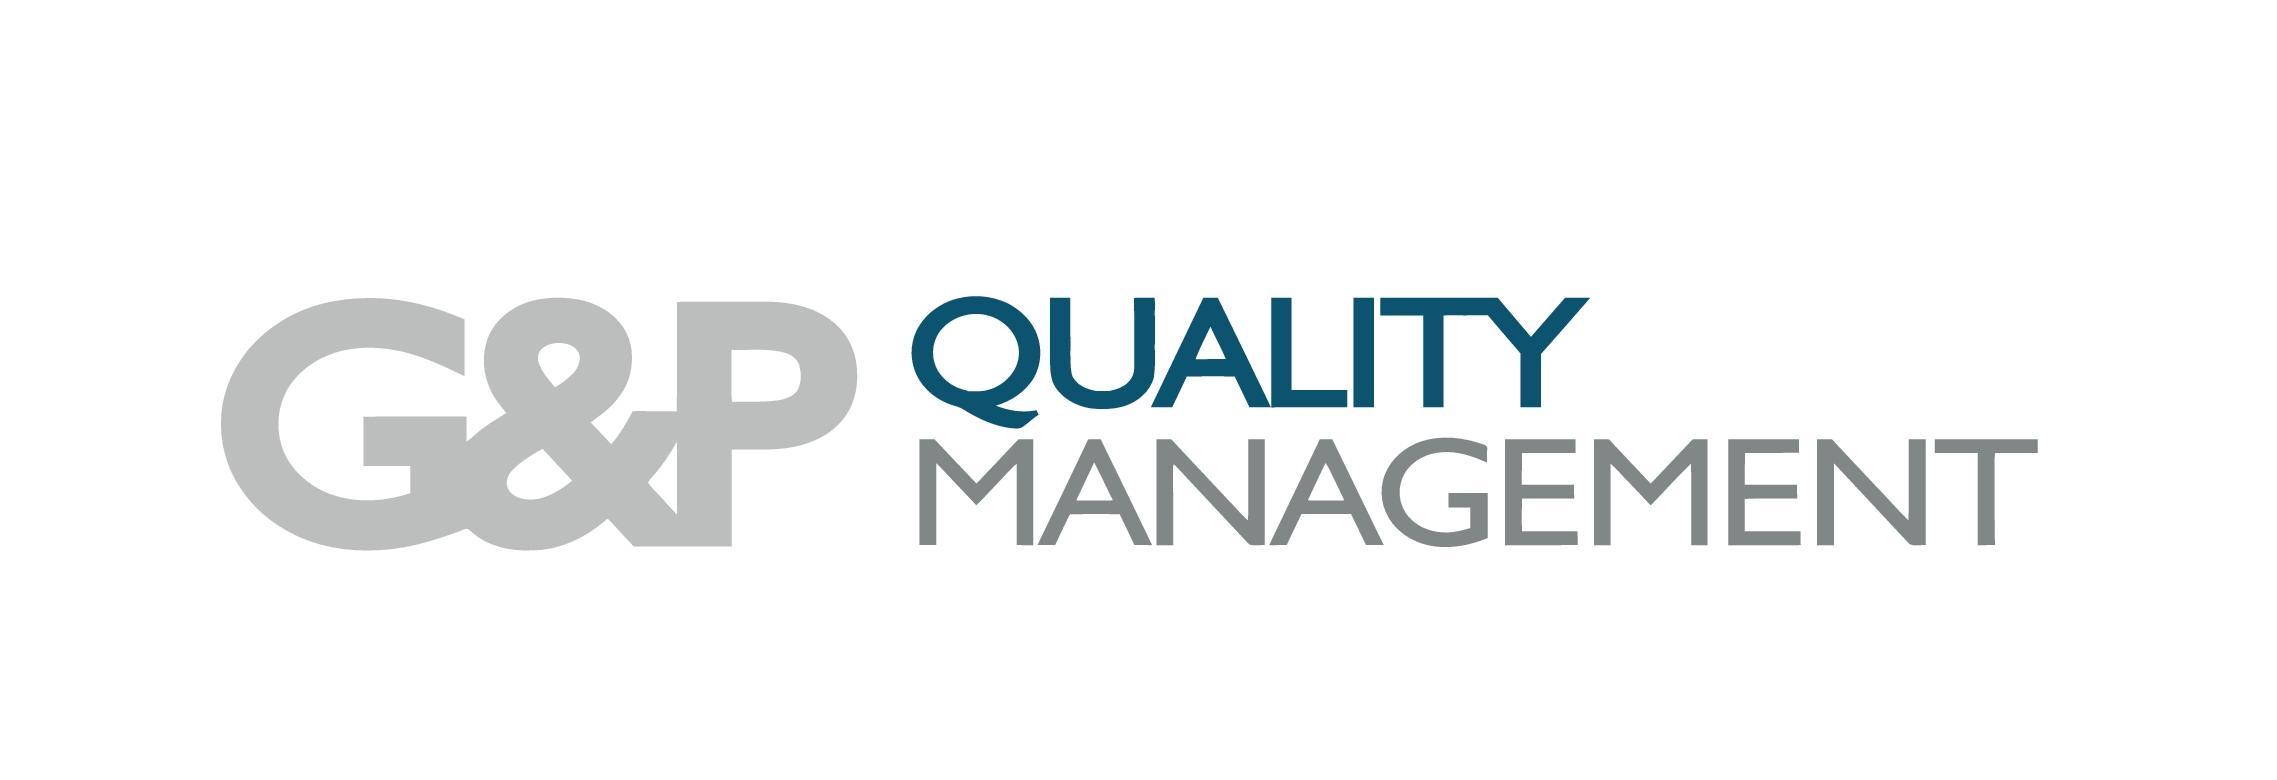 Goud G&P Quality Management